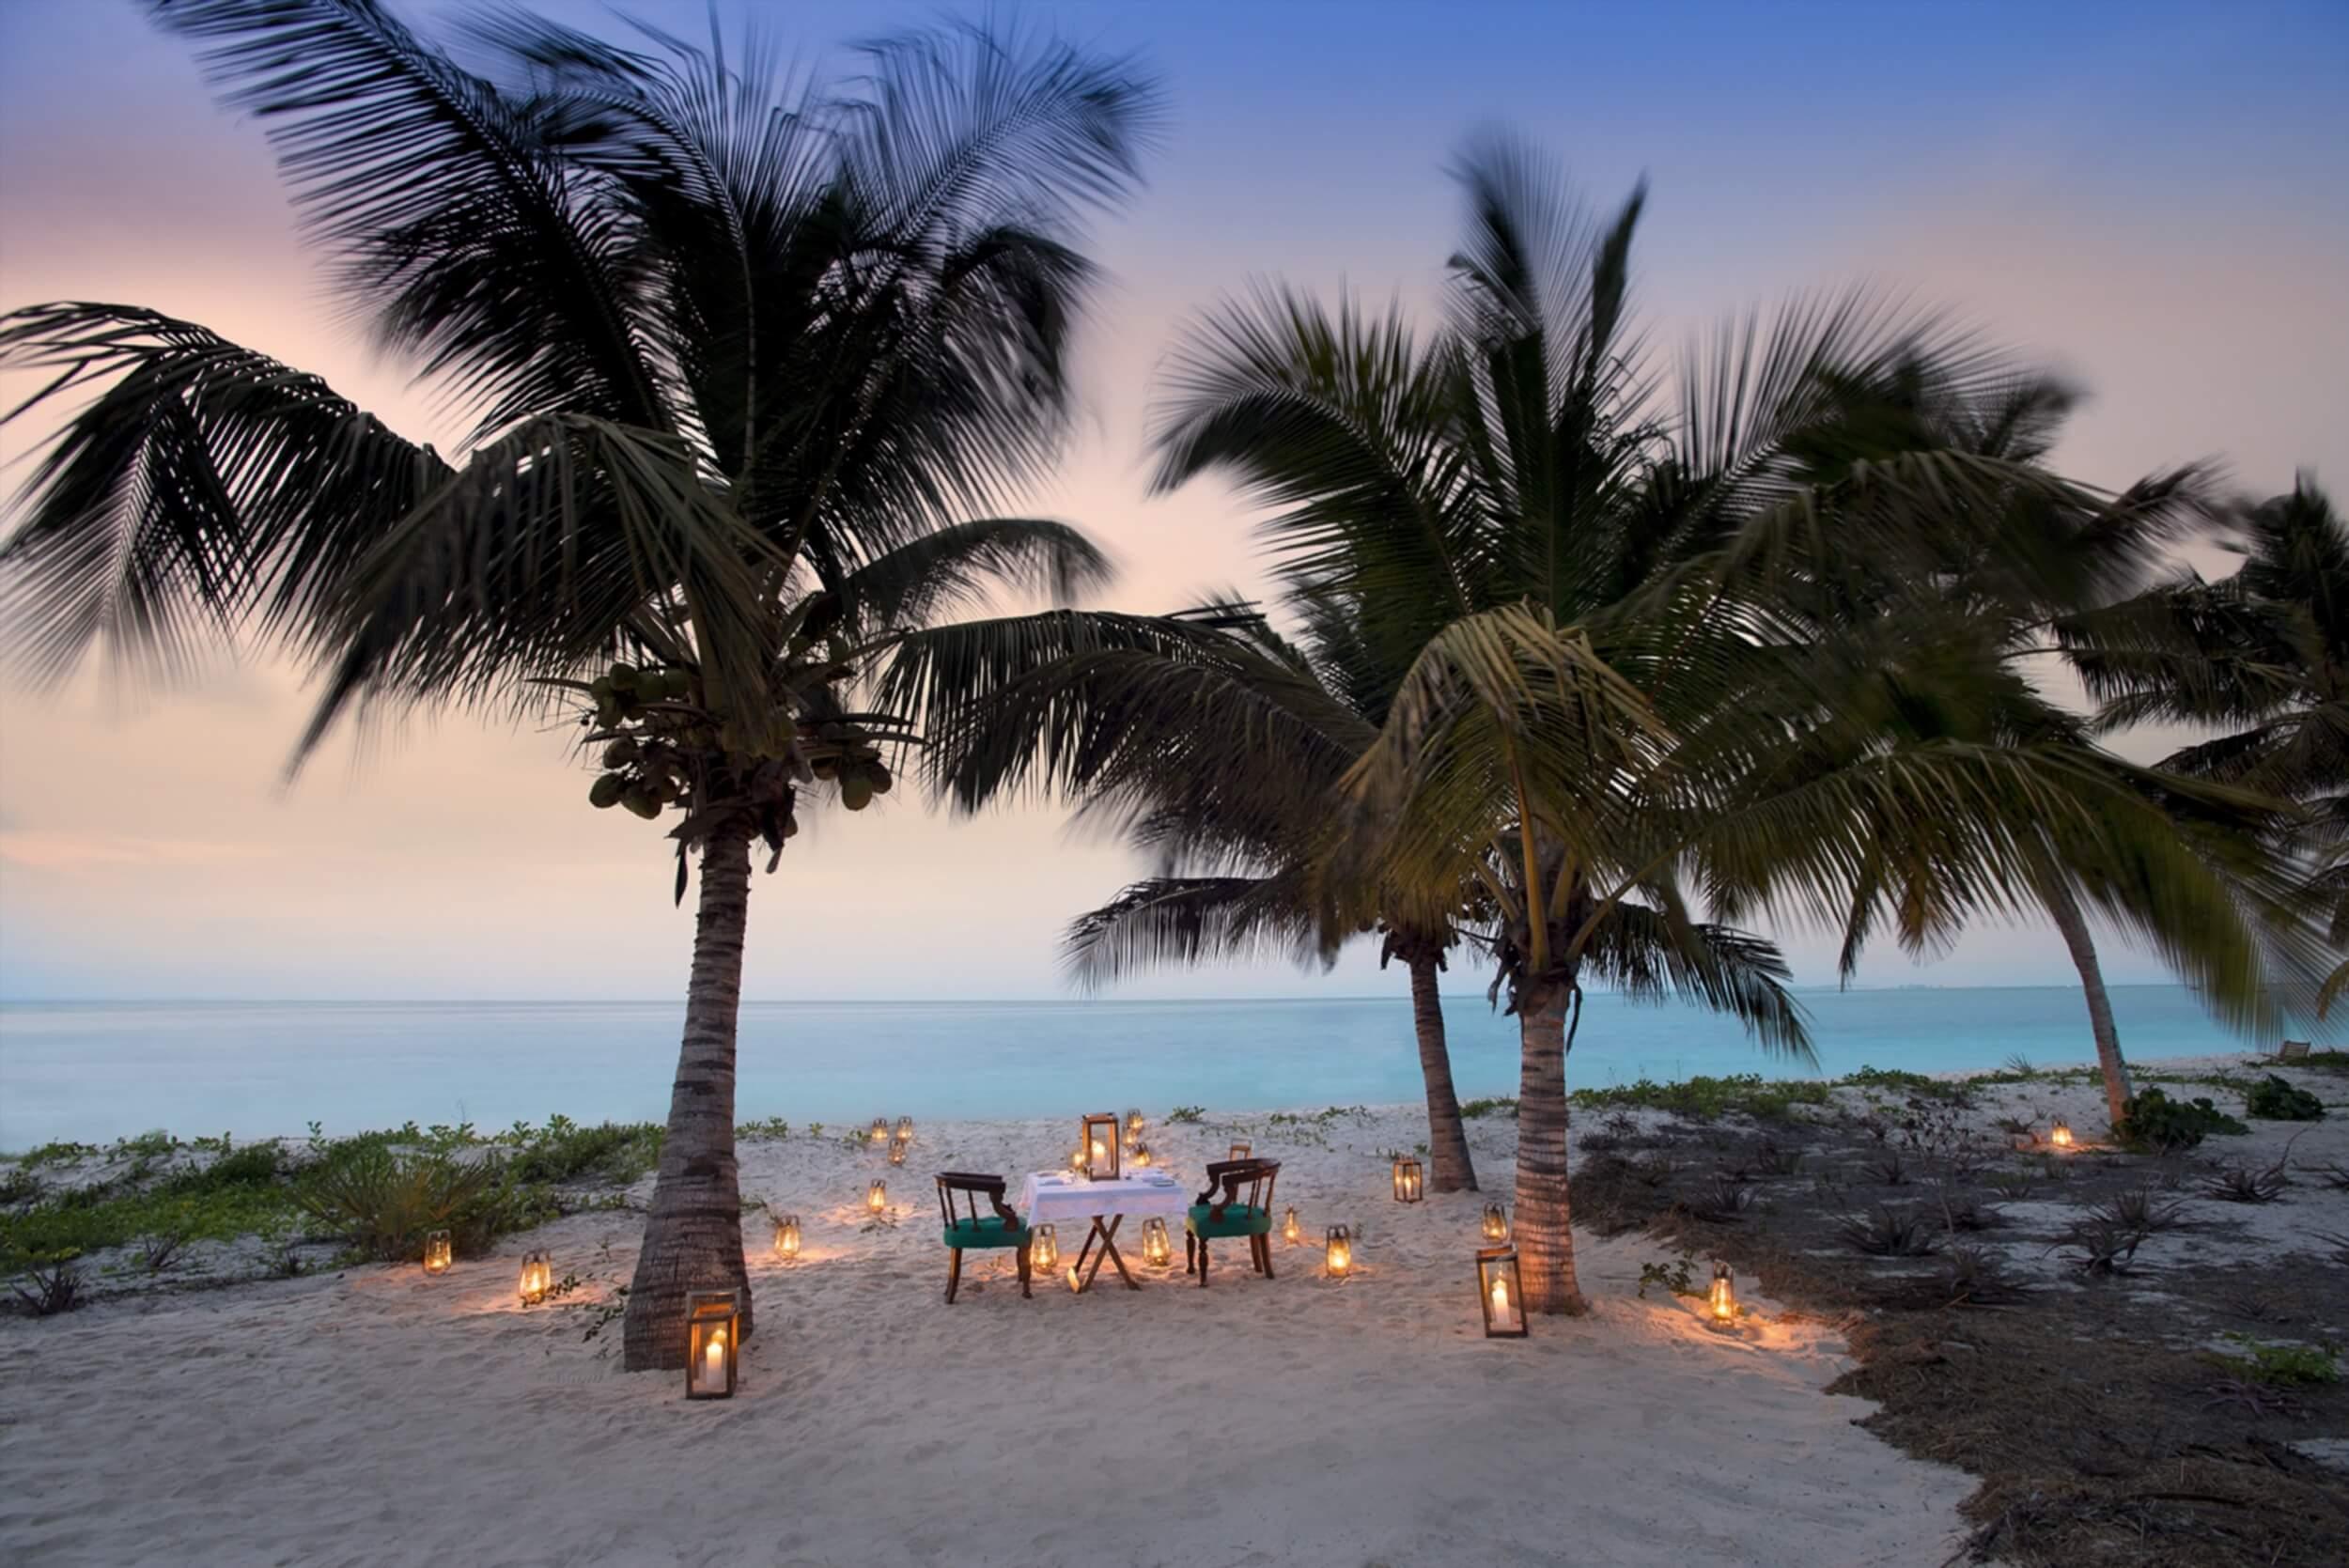 Benguerra-Island-Romantic-Private-Dining-1.jpg